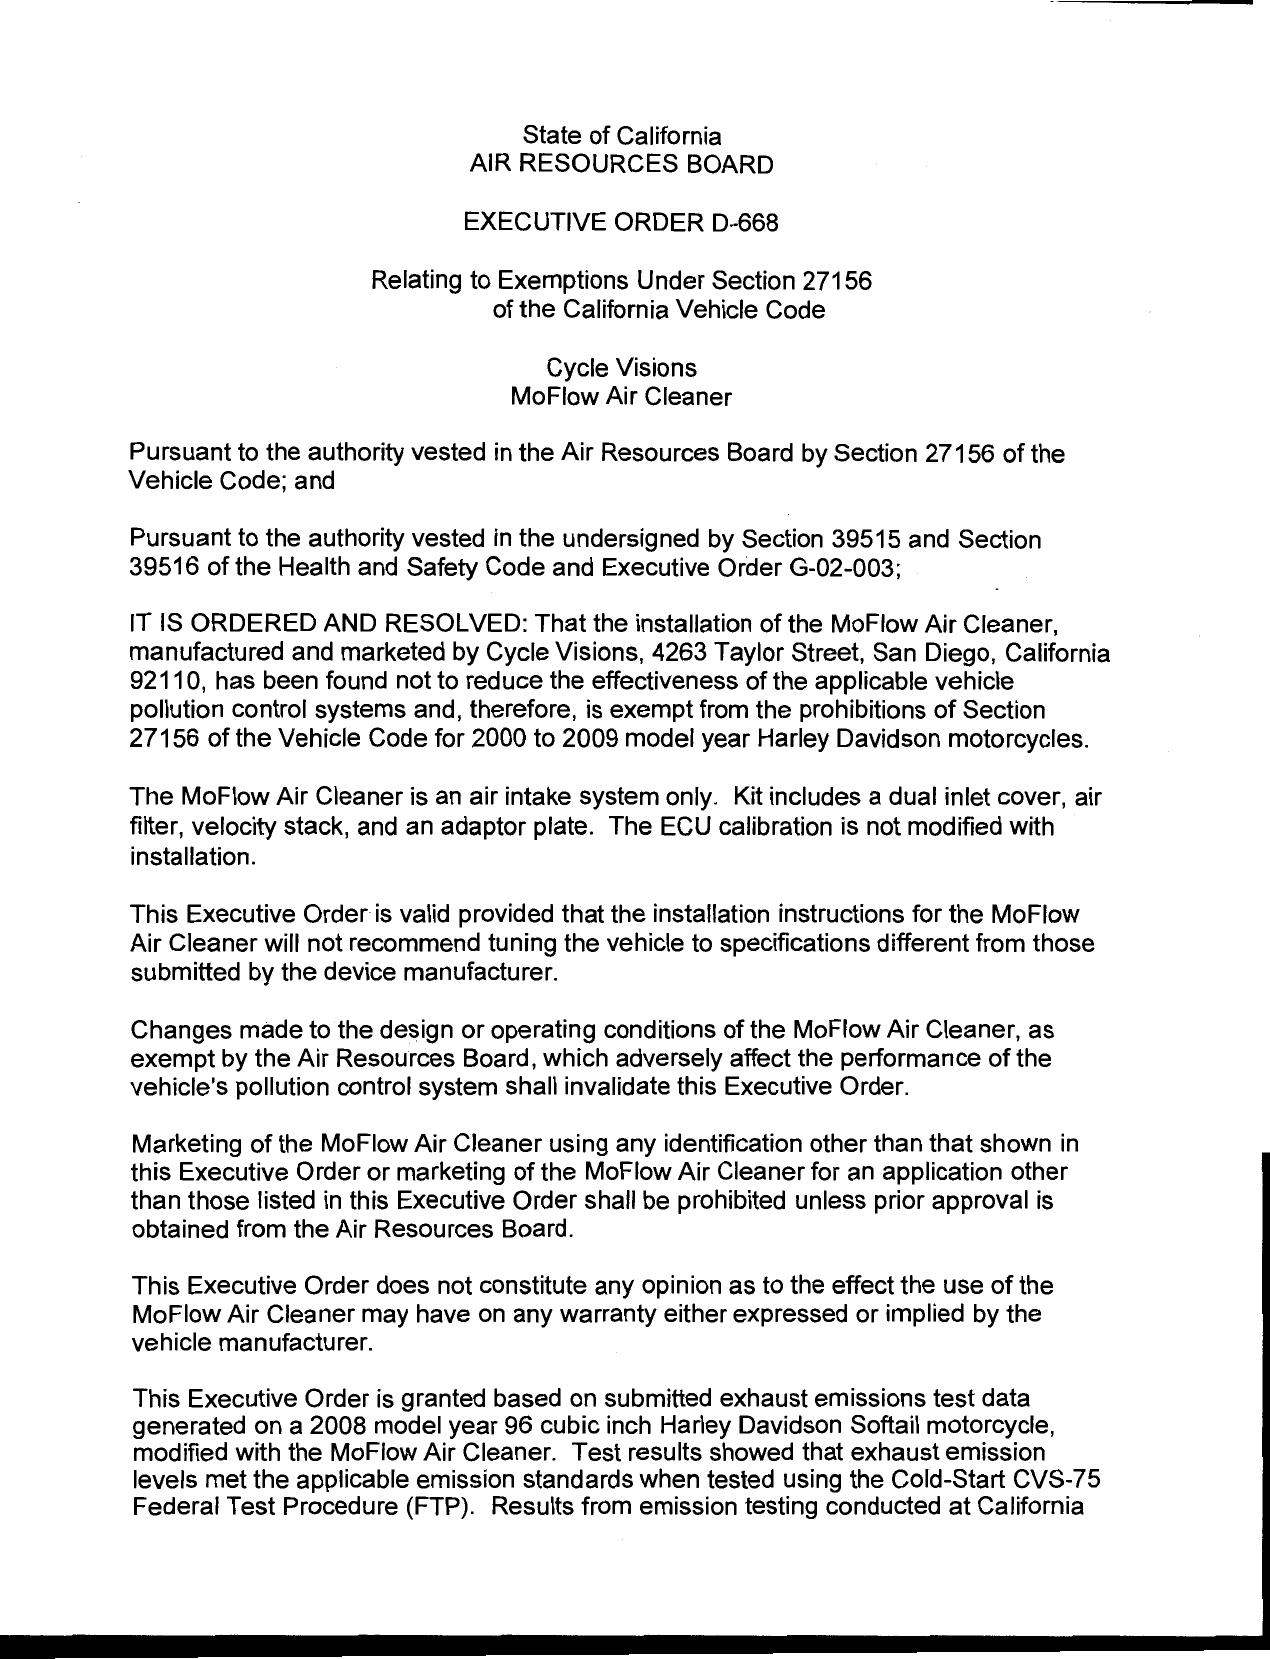 Executive Order D-668 Cycle Visions